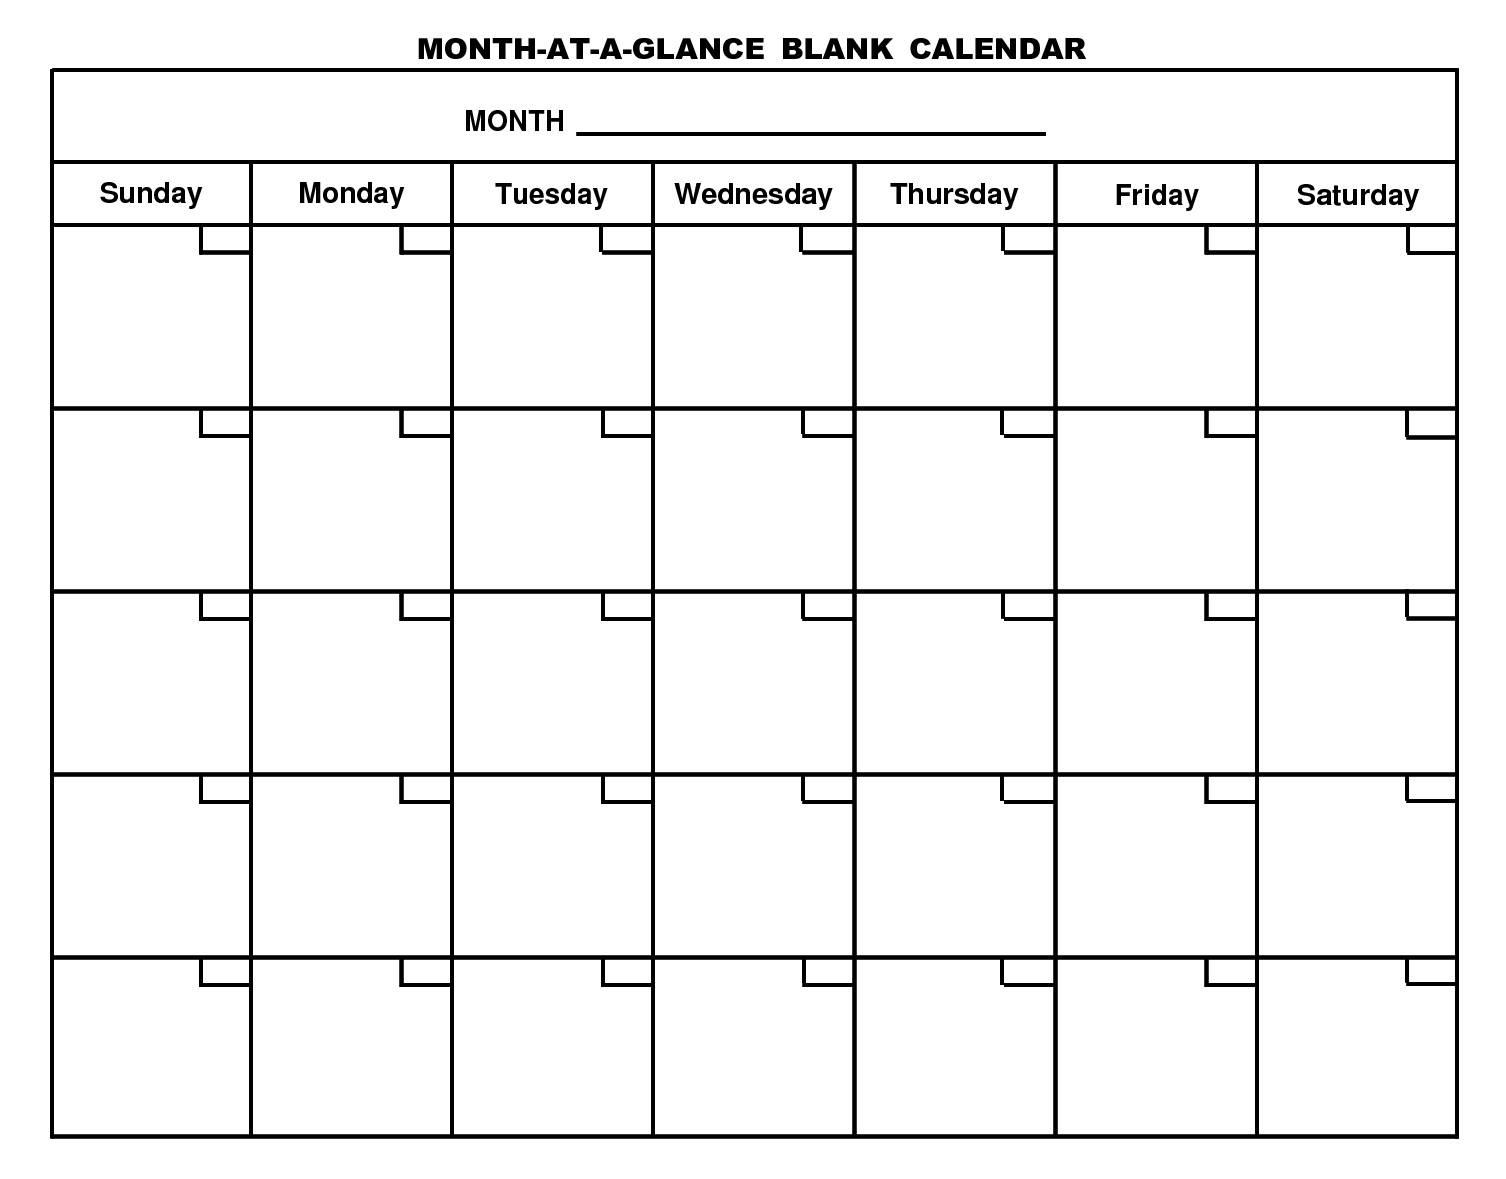 Monthly Calendar Template | Monthly Calendar 2017  Blank Printable Weekly Calendars Templates